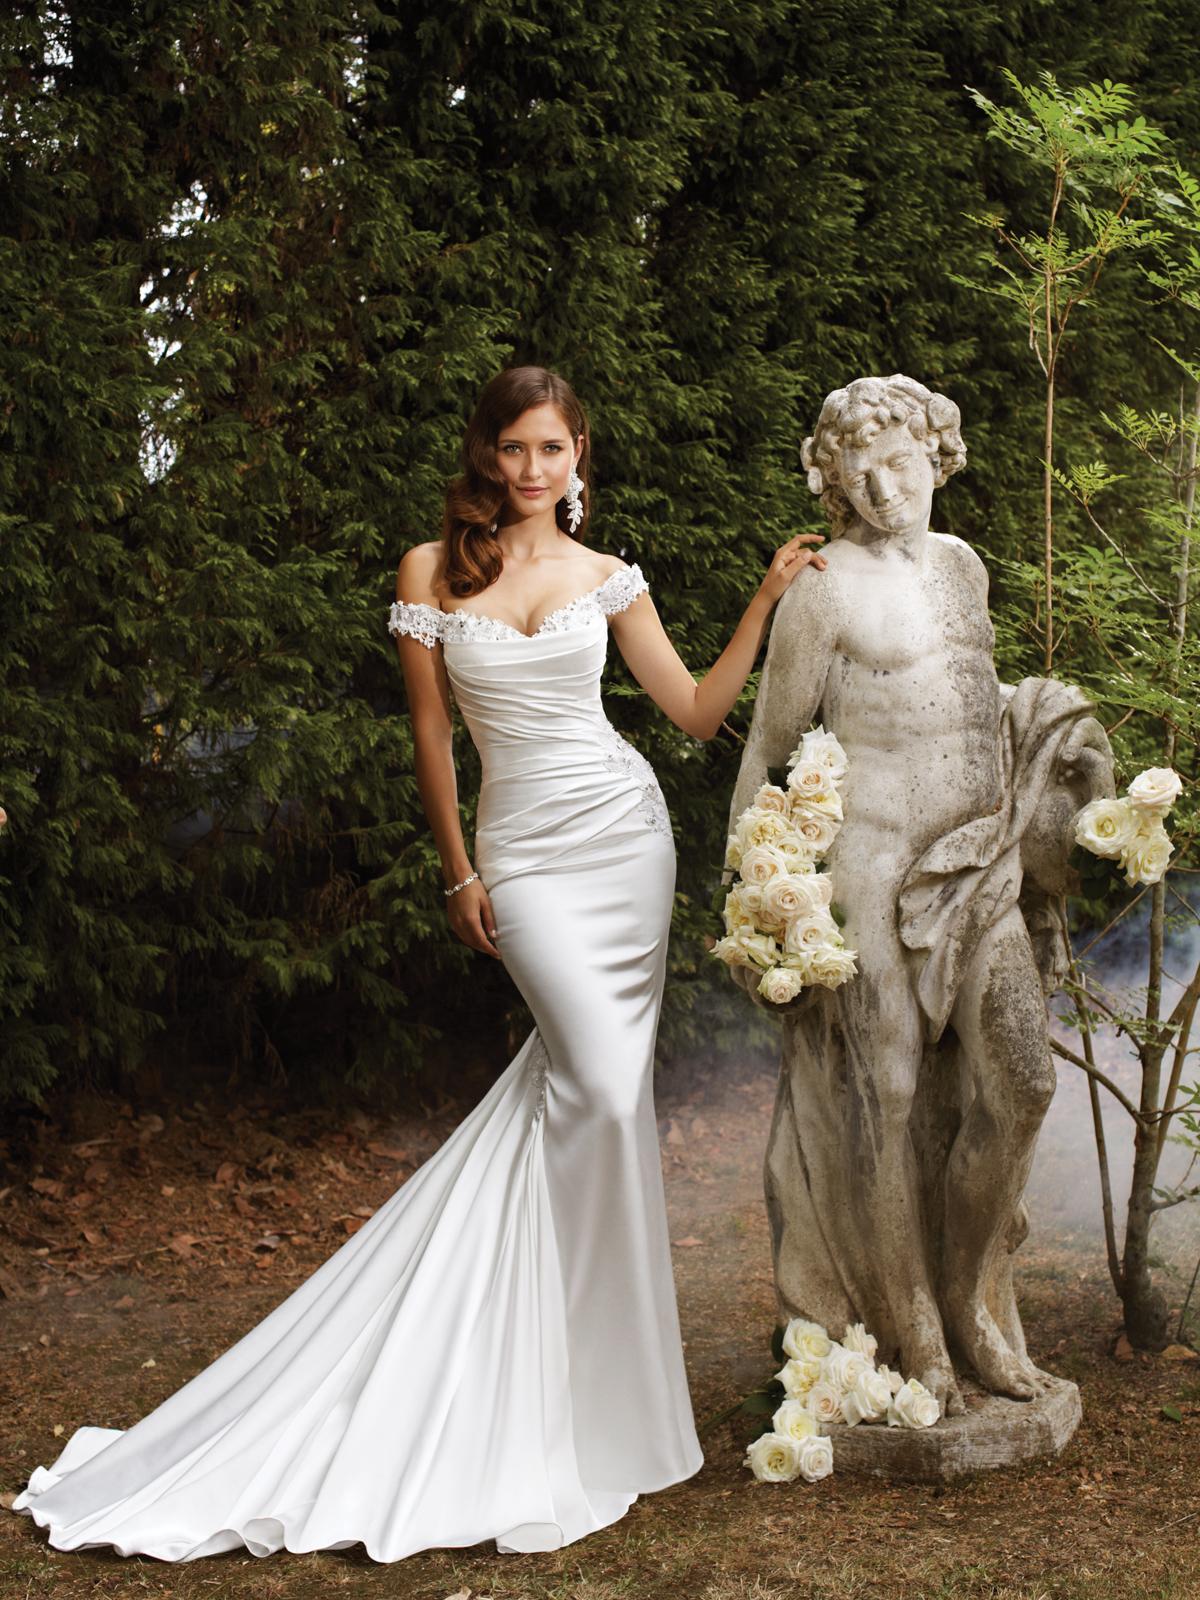 ANN MATTHEW BRIDAL ALBUQUERQUE WEDDING DRESSES